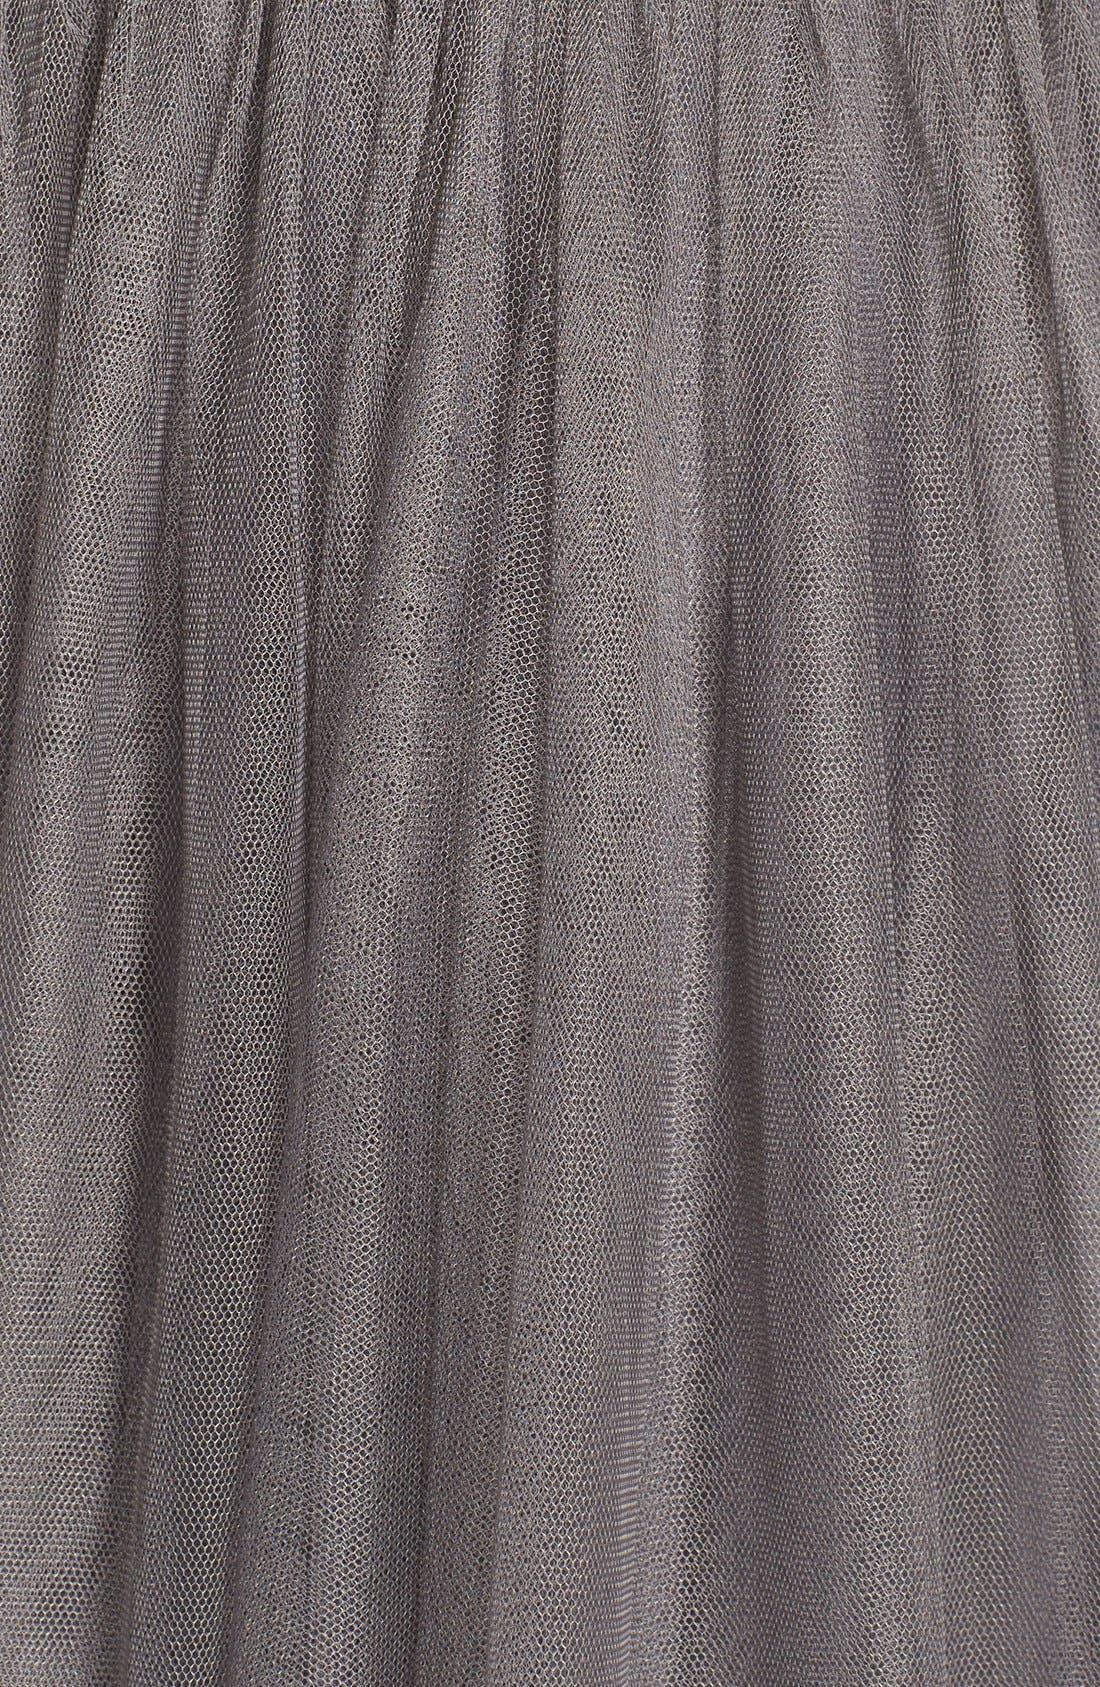 Maia Convertible Tulle Tea Length Fit & Flare Dress,                             Alternate thumbnail 2, color,                             028